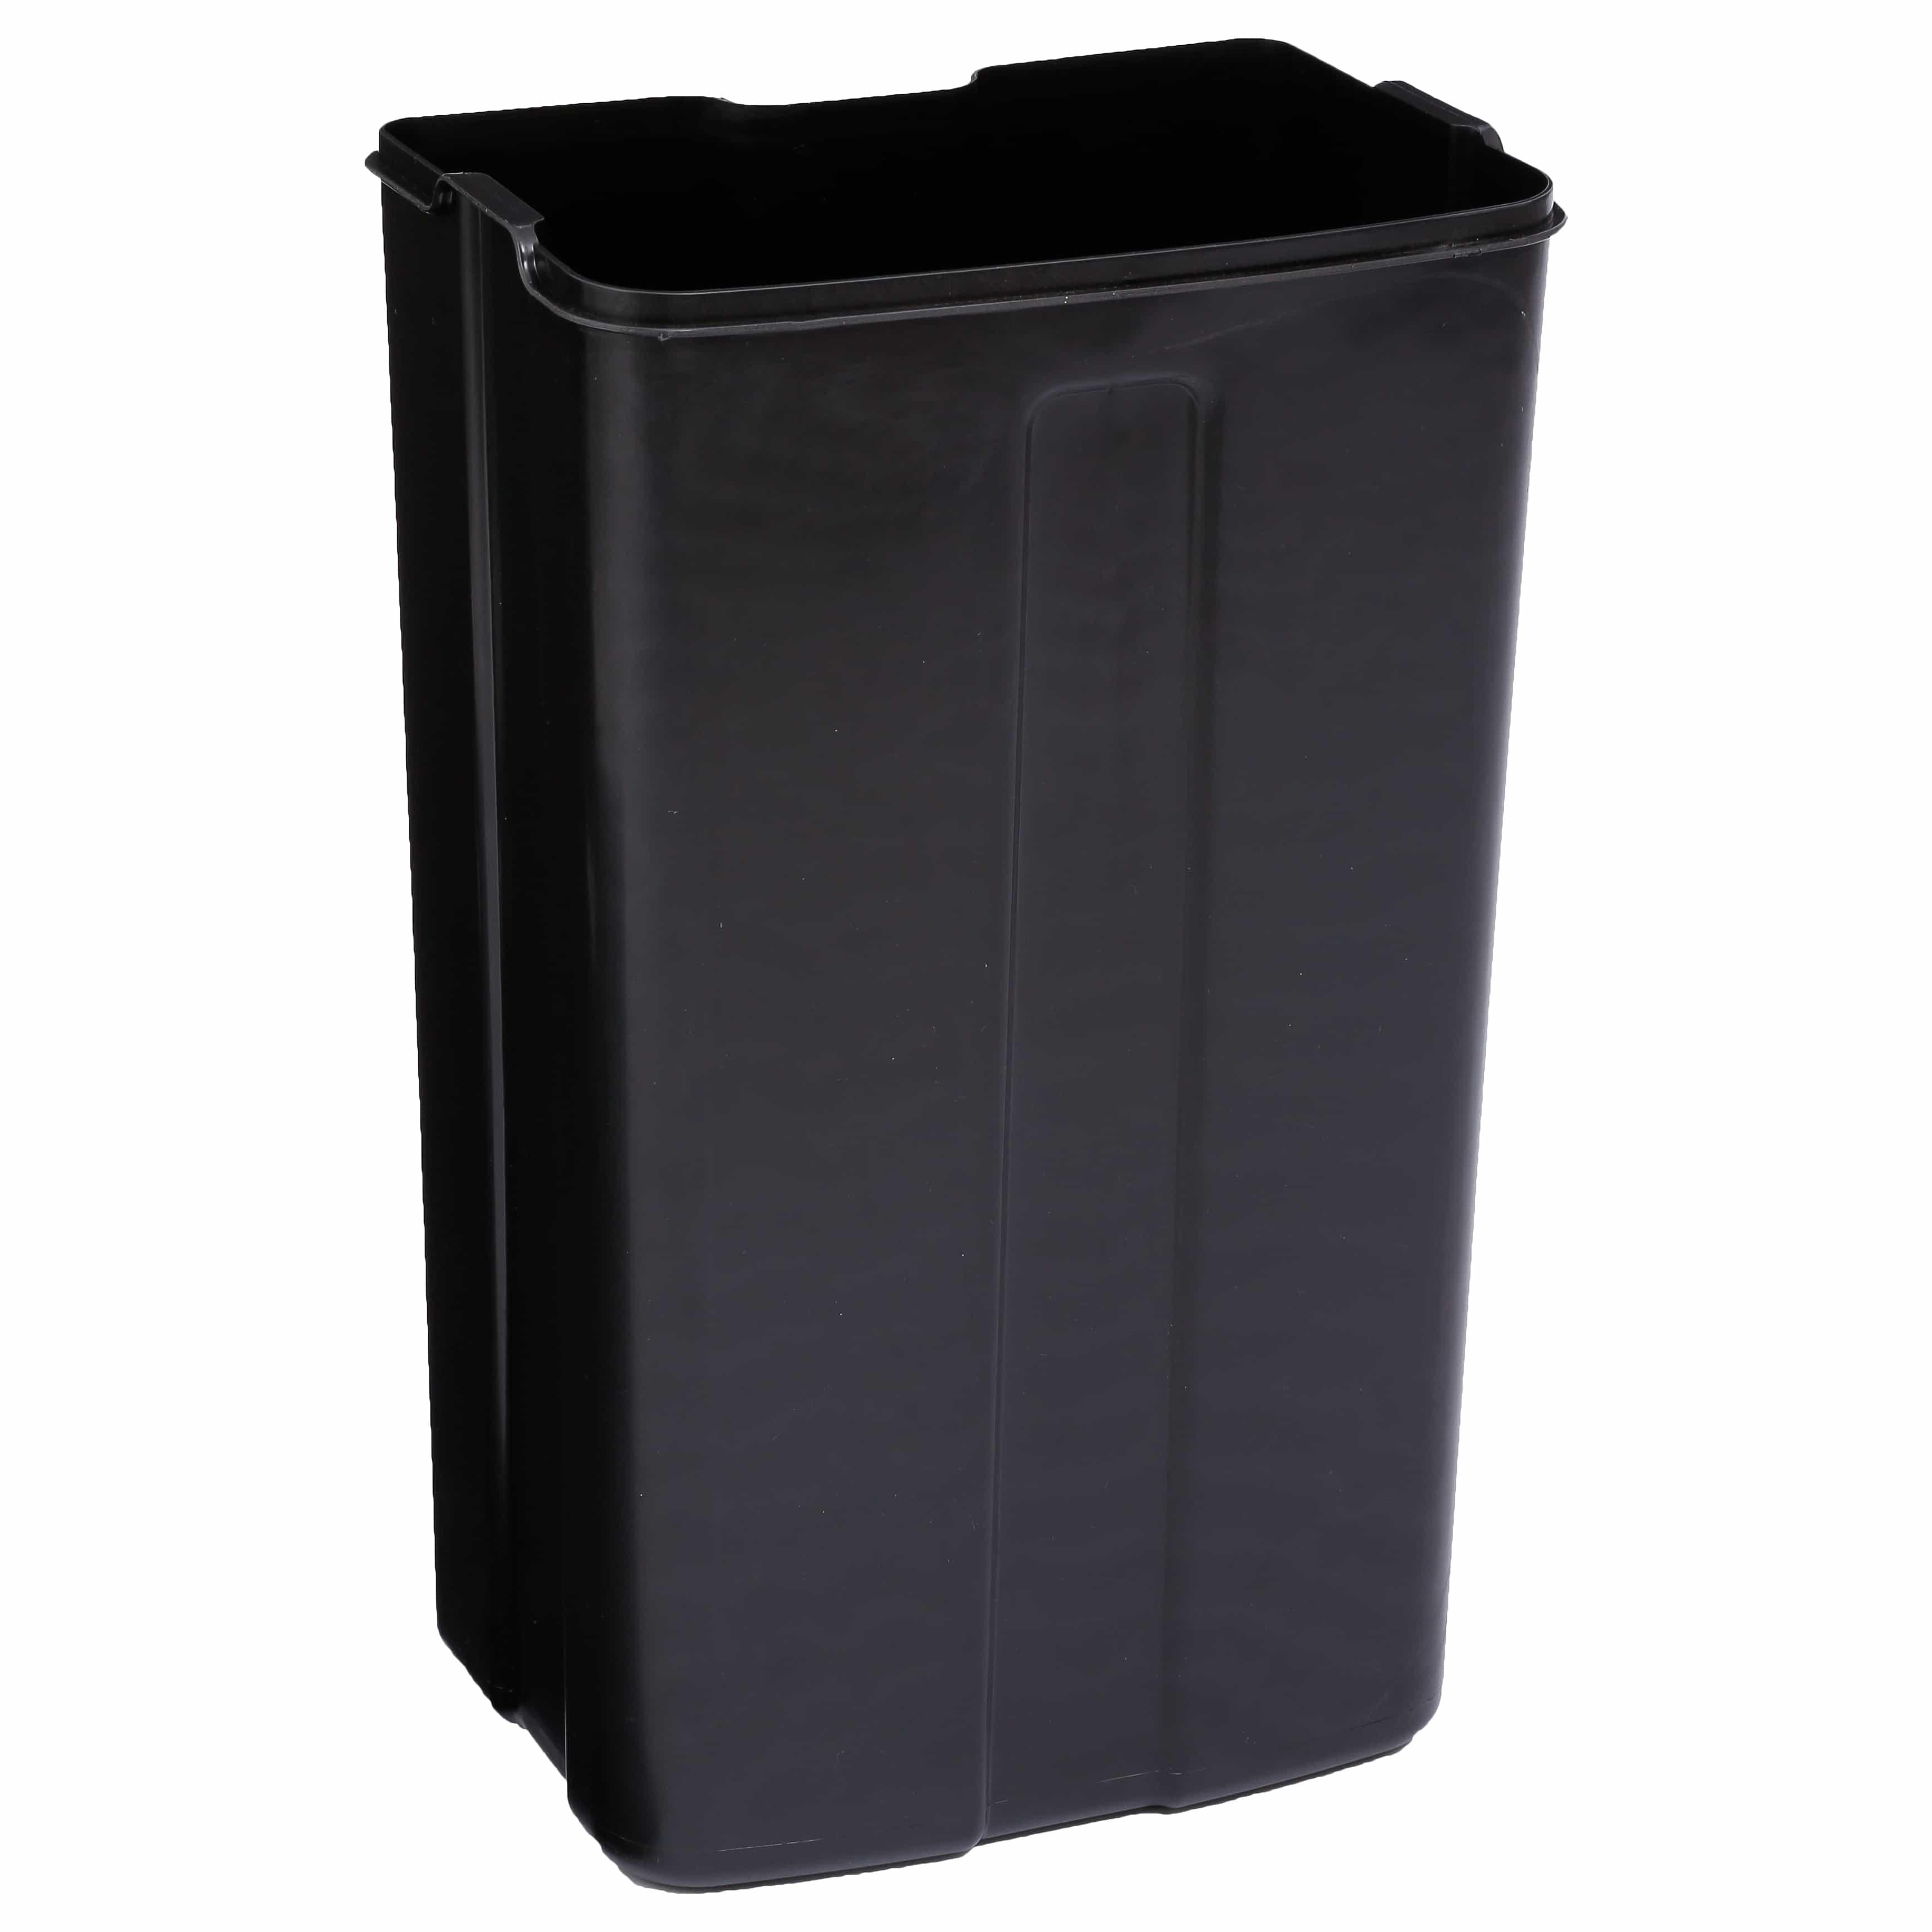 4goodz pedaalemmer 30 liter met uitneembare emmer 34x32x61cm - Zwart